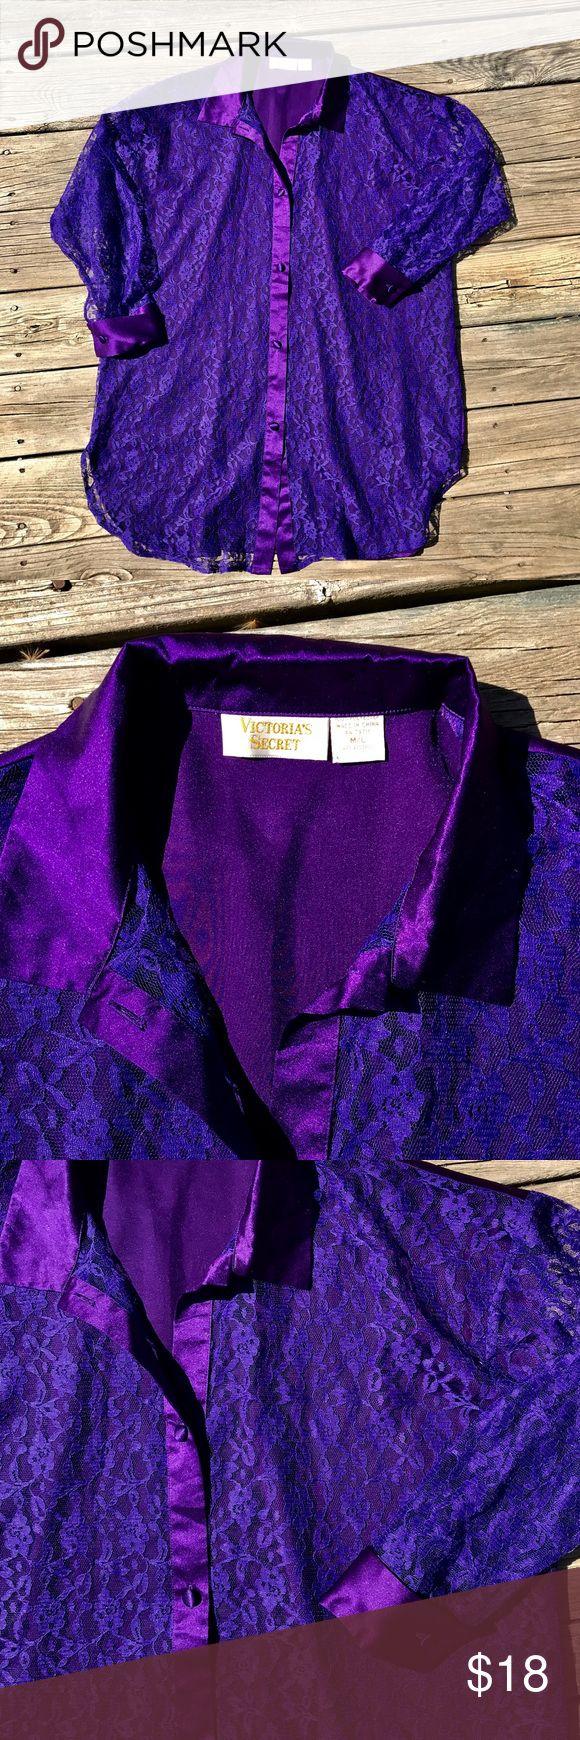 "VICTORIA'S SECRET M/L Purple Lace Sleep Shirt Like new purple lace and satin feel sleep shirt. Pit to pit measures 27"". Shoulders 25"". Sleeve Length 32"". Length 36"". 100% Polyester Machine Wash Cold Gentle Cycle. Victoria's Secret Intimates & Sleepwear Chemises & Slips"